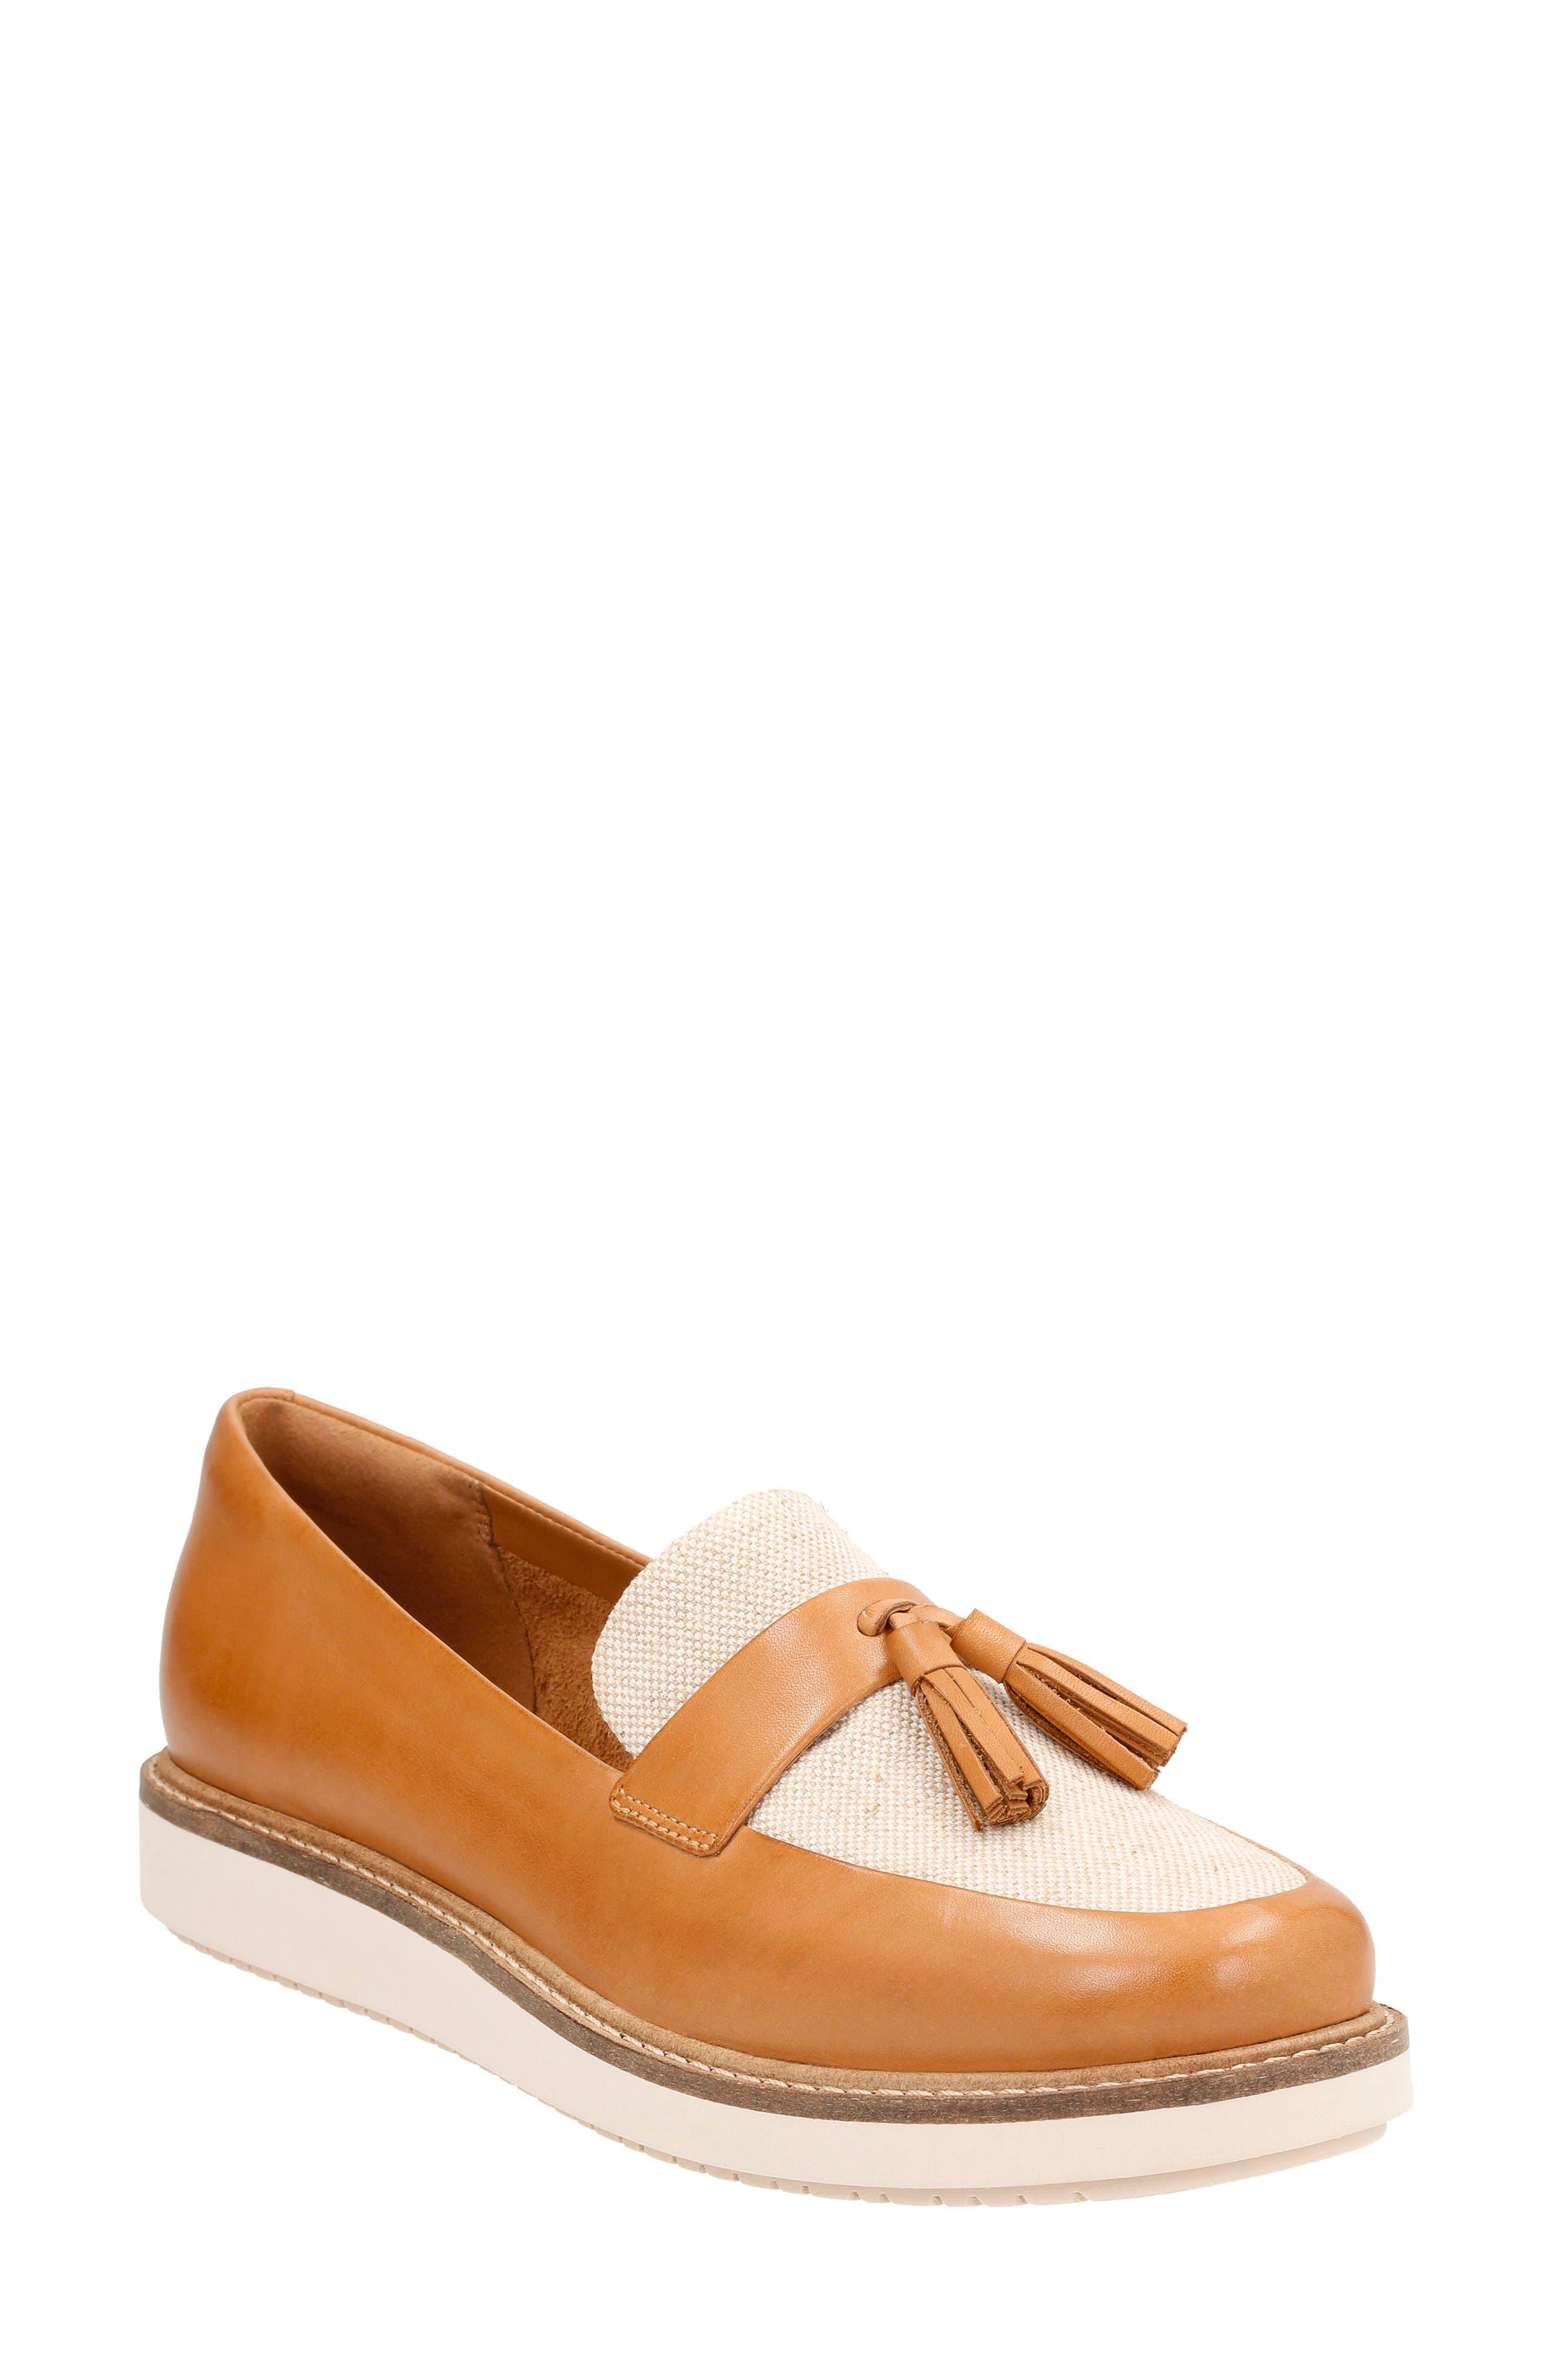 Glick Castine Tassel Loafer,                             Main thumbnail 1, color,                             Light Tan Leather